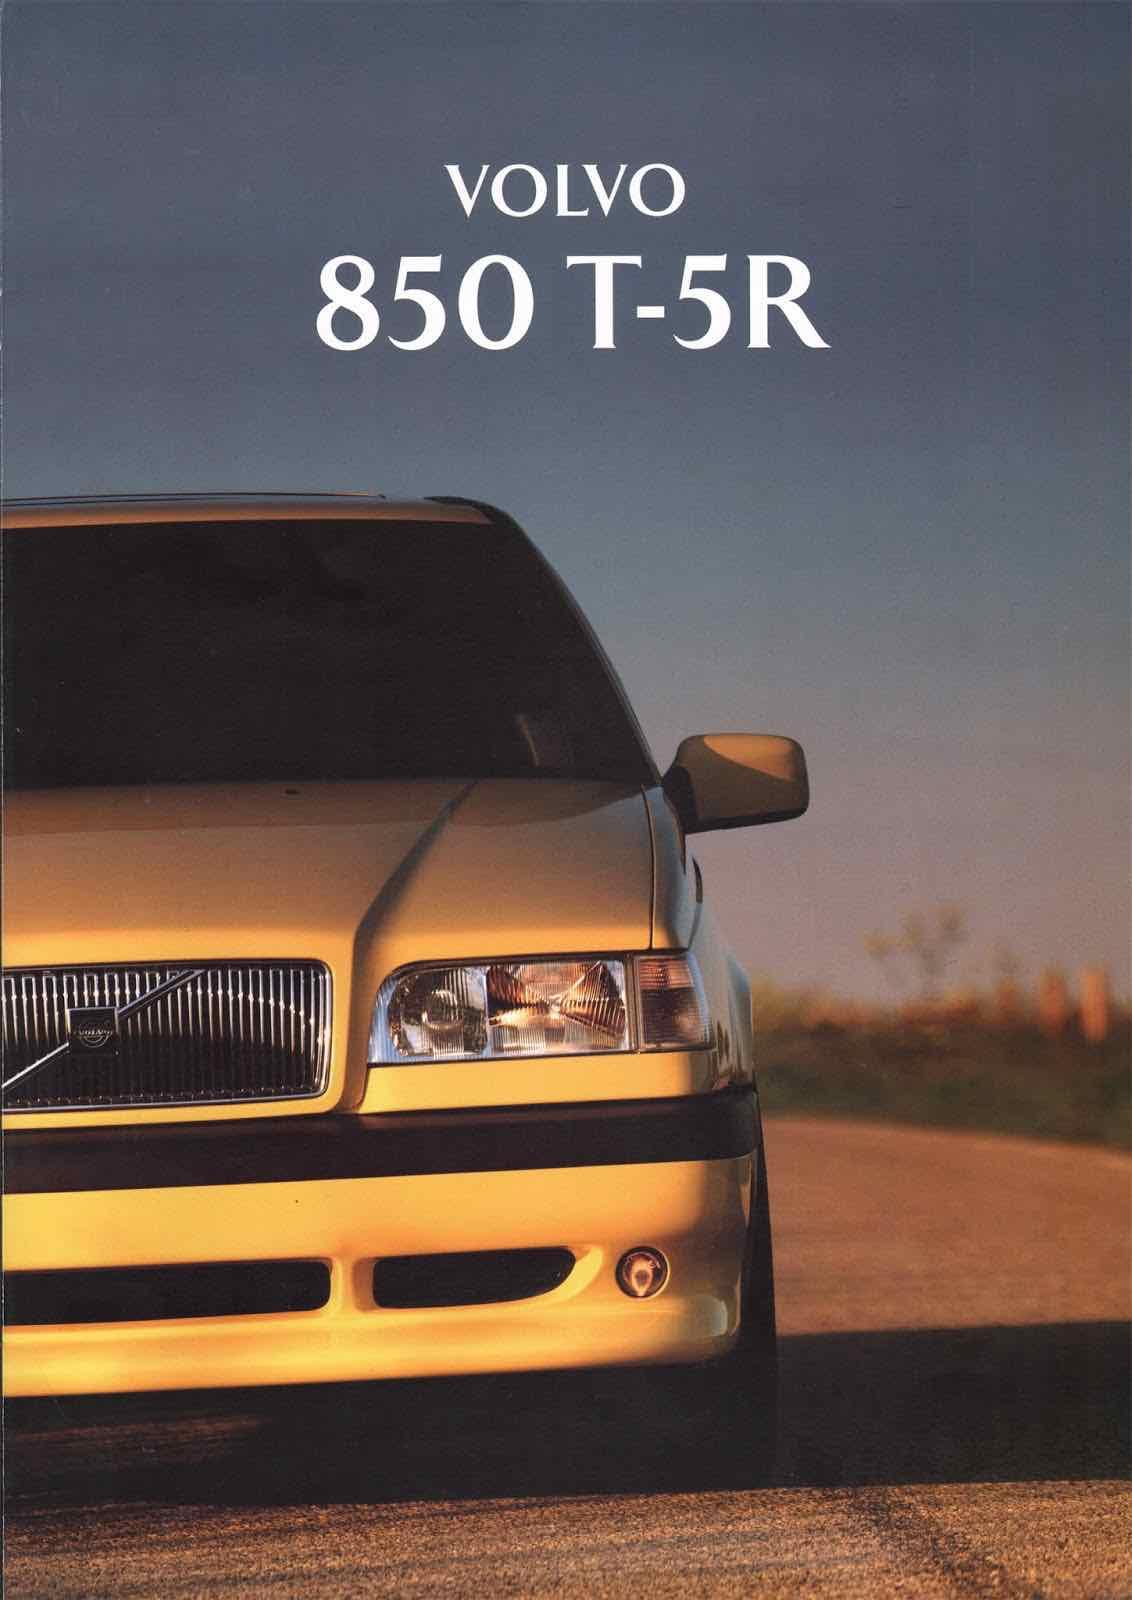 Volvo 850 T5 R Brochure Se -